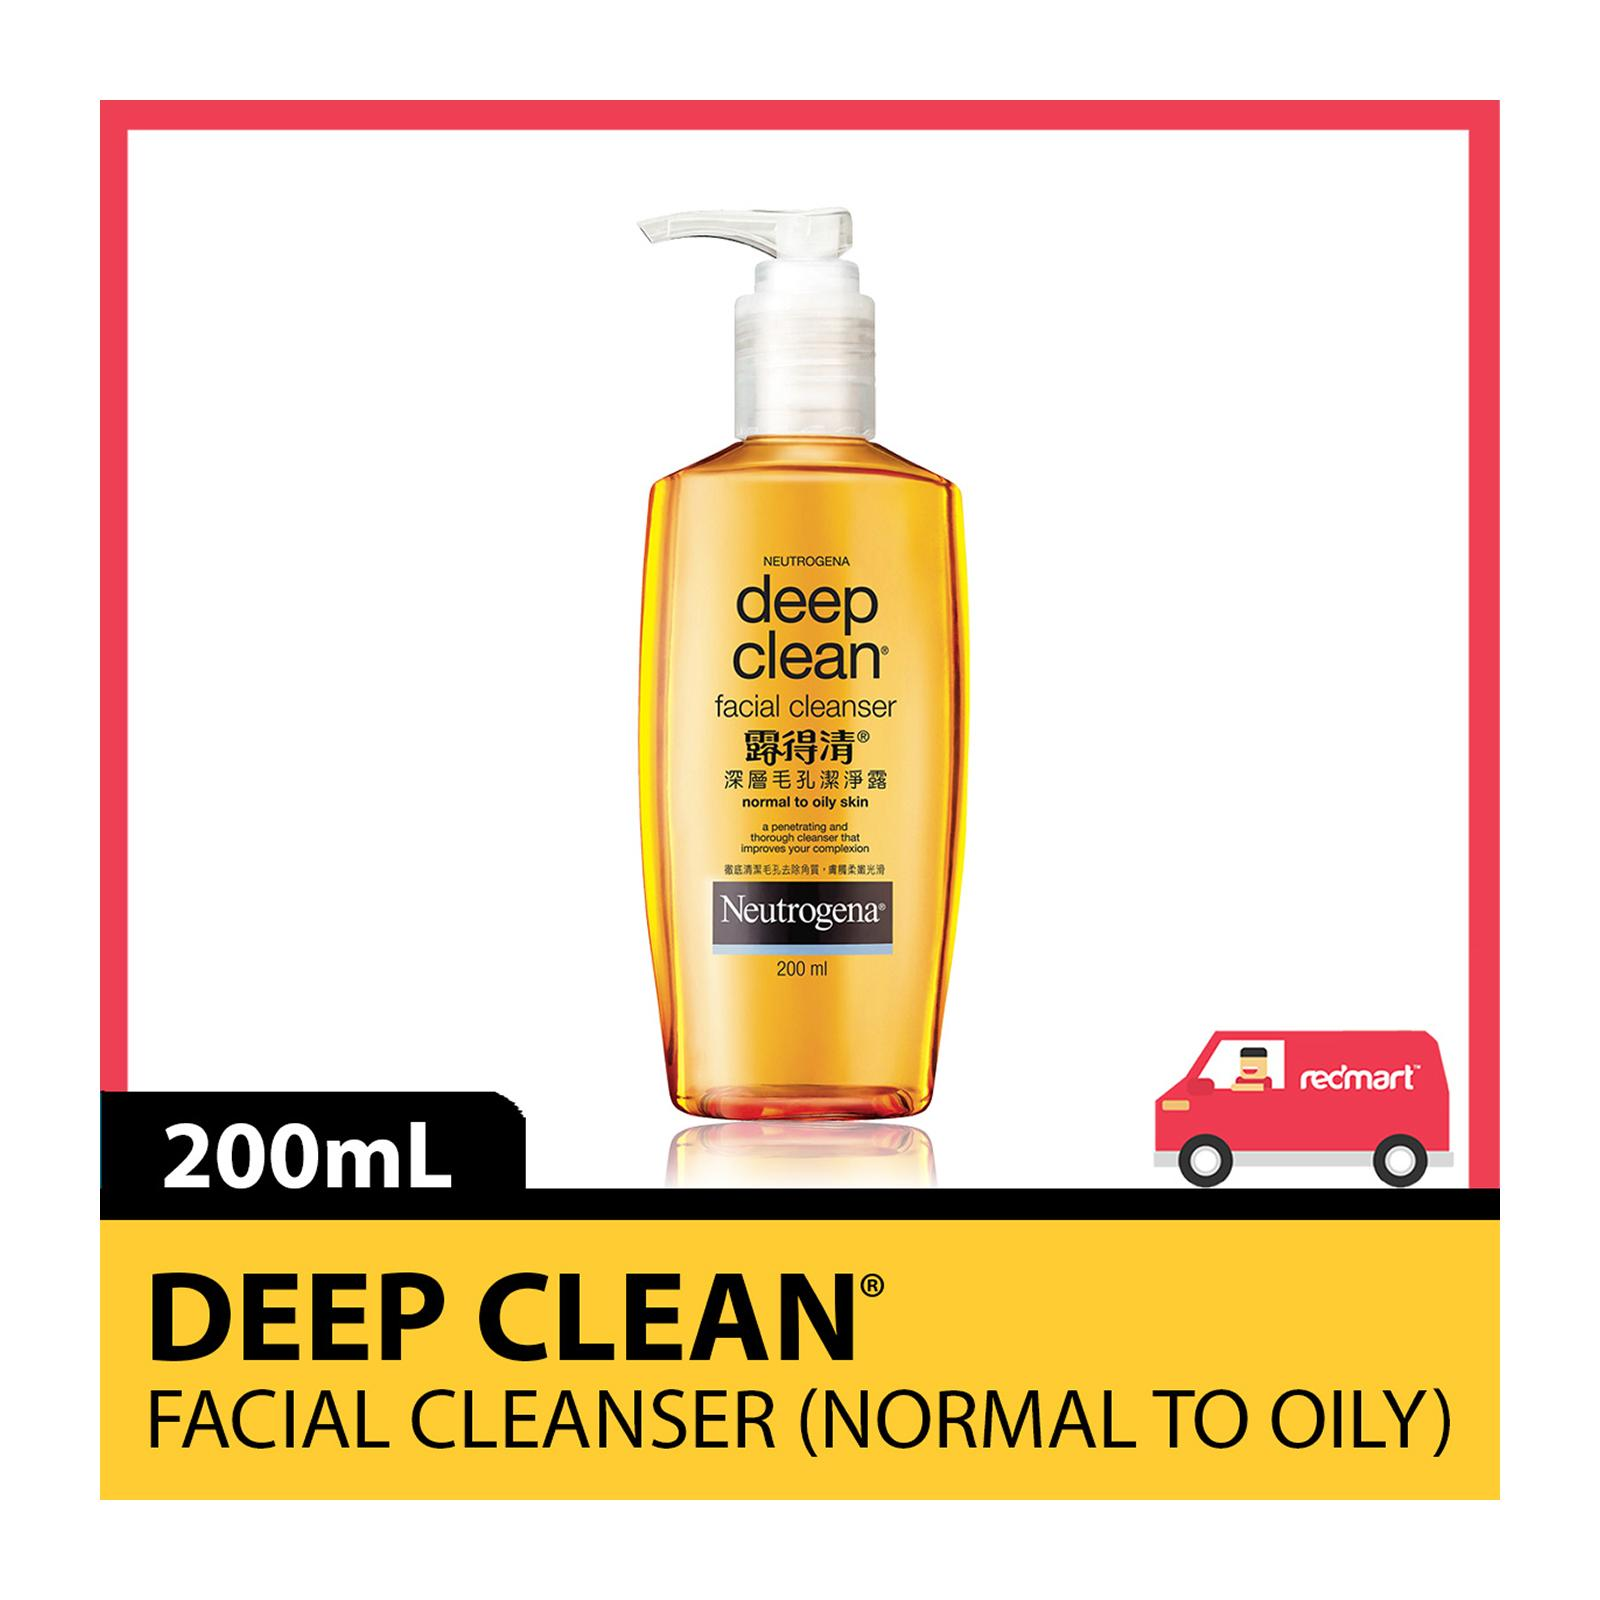 NEUTROGENA Deep Clean Facial Cleanser (Normal/Oily) 200ml